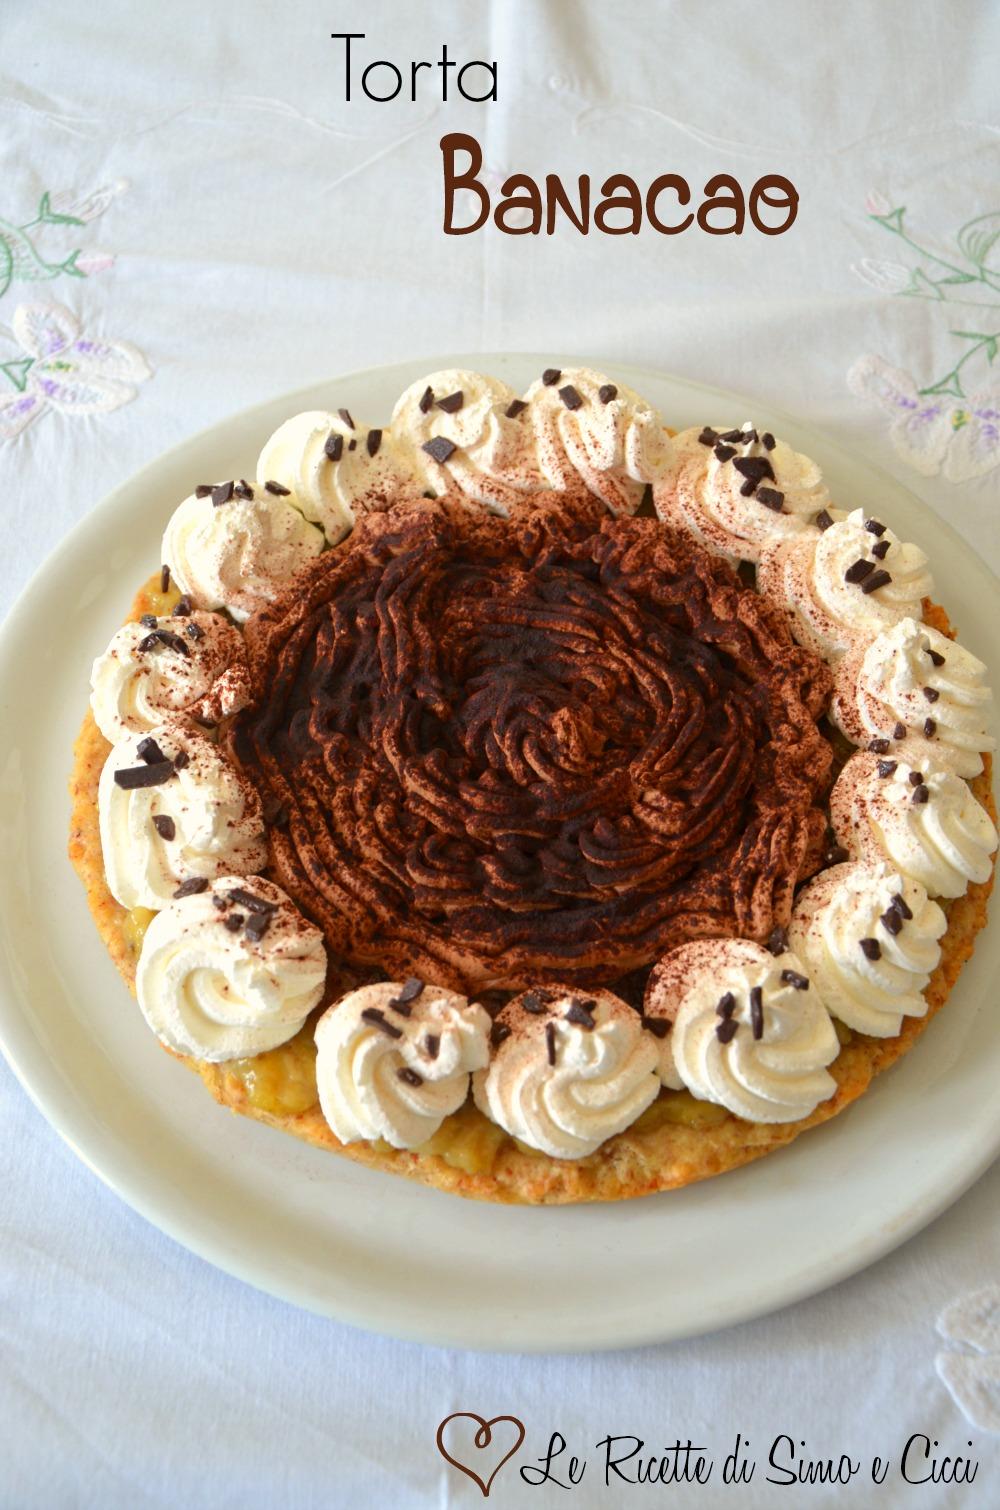 Torta Banacao